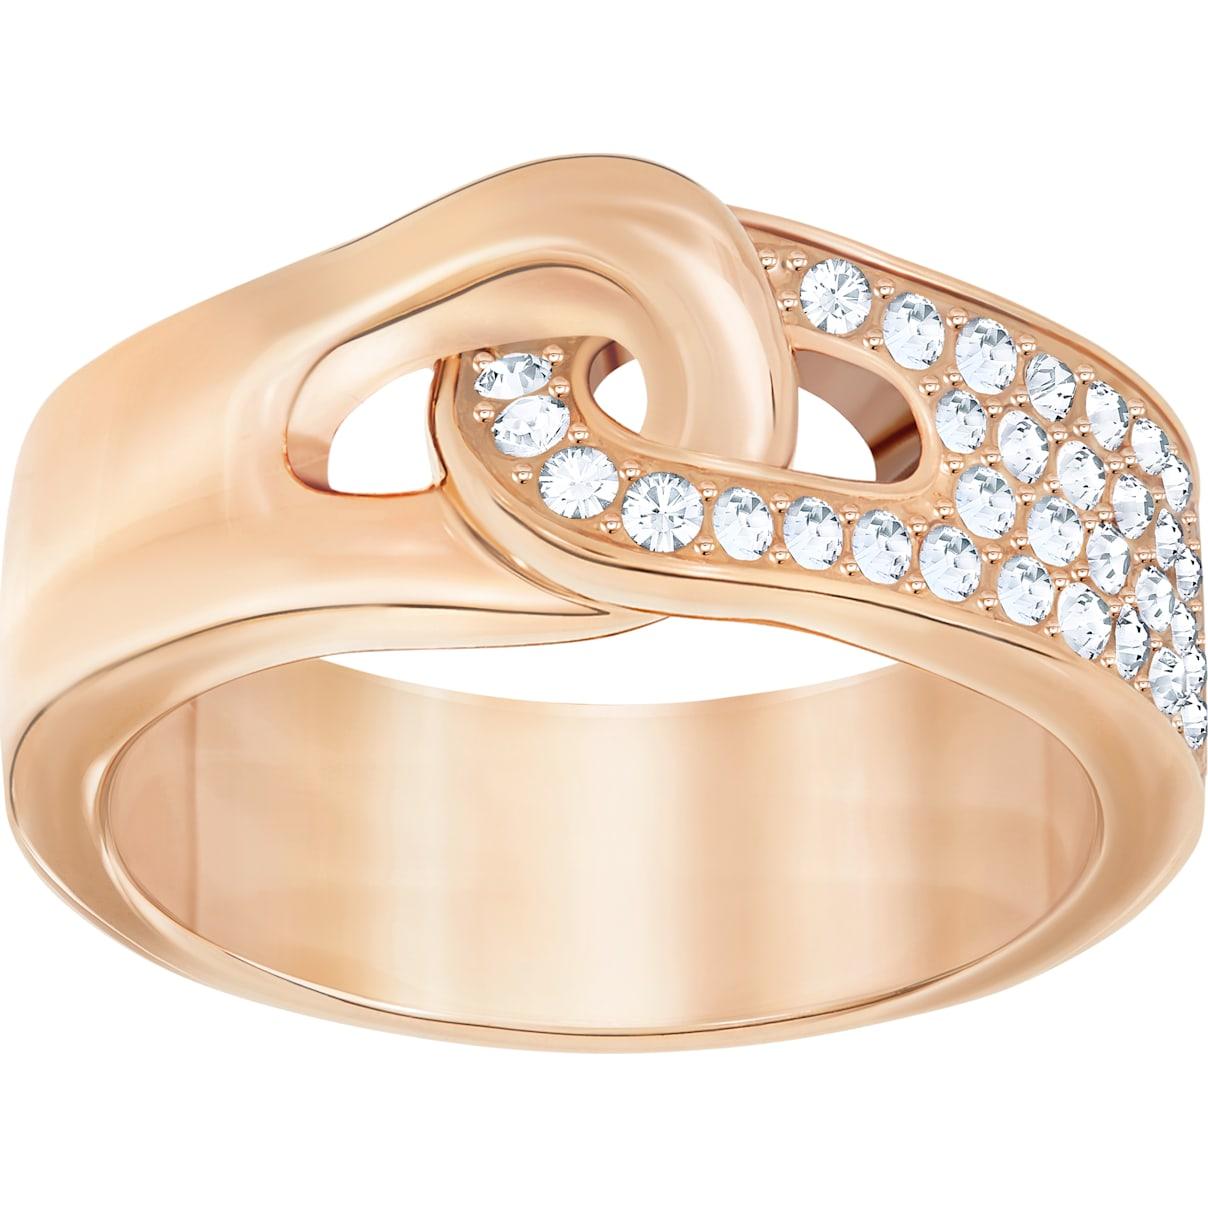 Swarovski Gallon Ring, White, Rose-gold tone plated